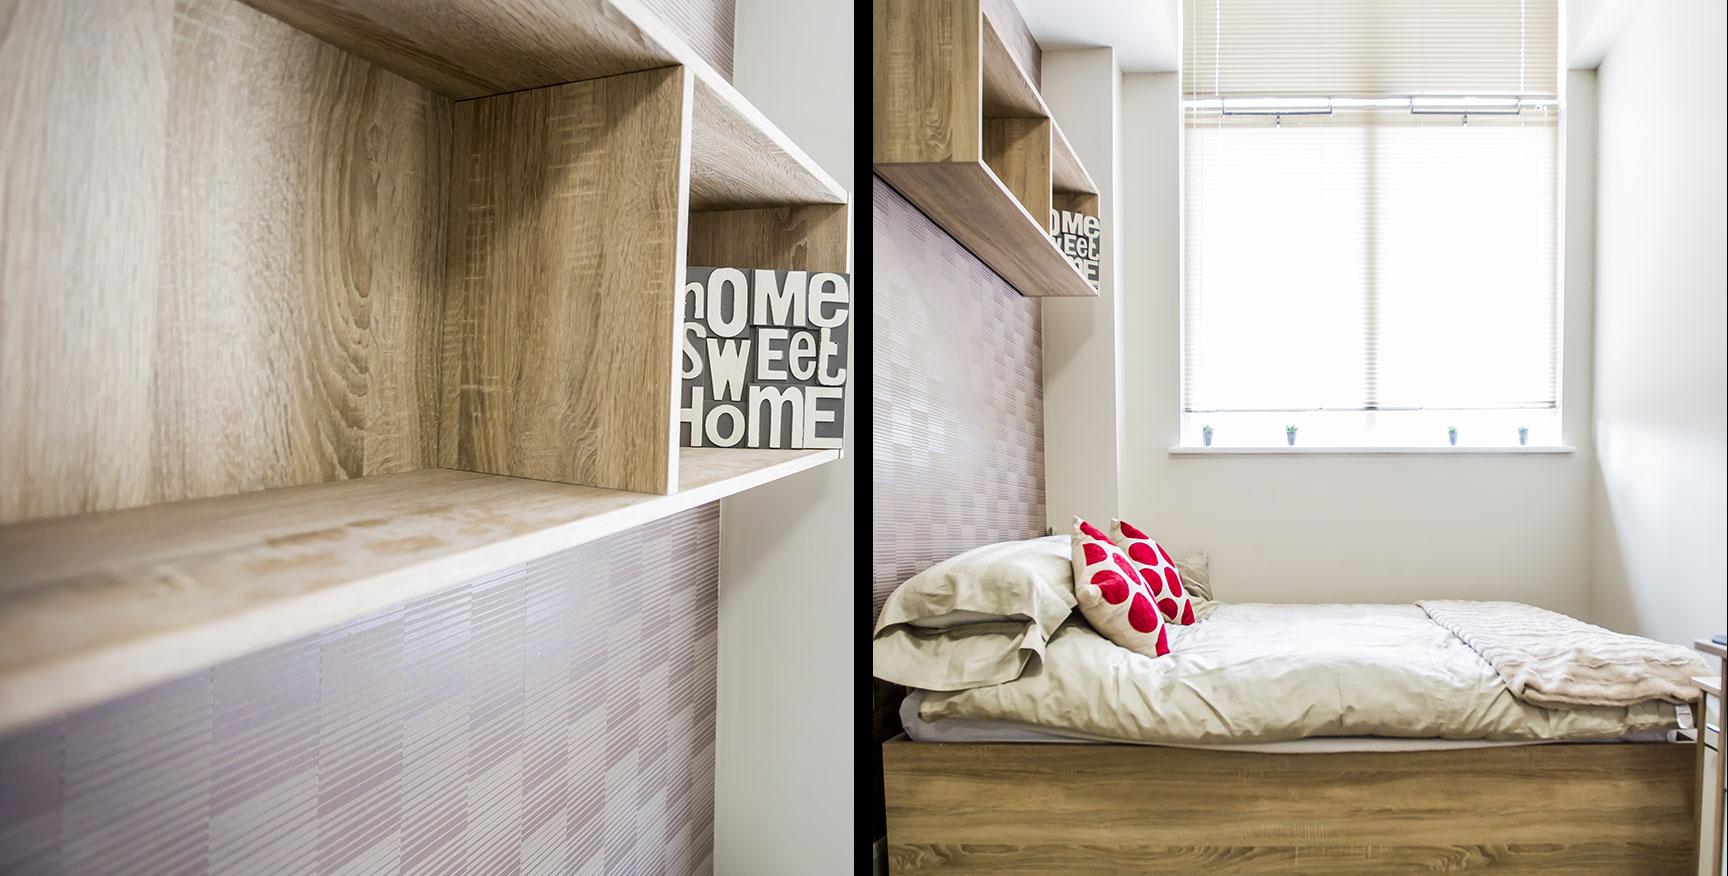 Alexandra House - Luxury Student Accommodation Sheffield (internal view of studio)